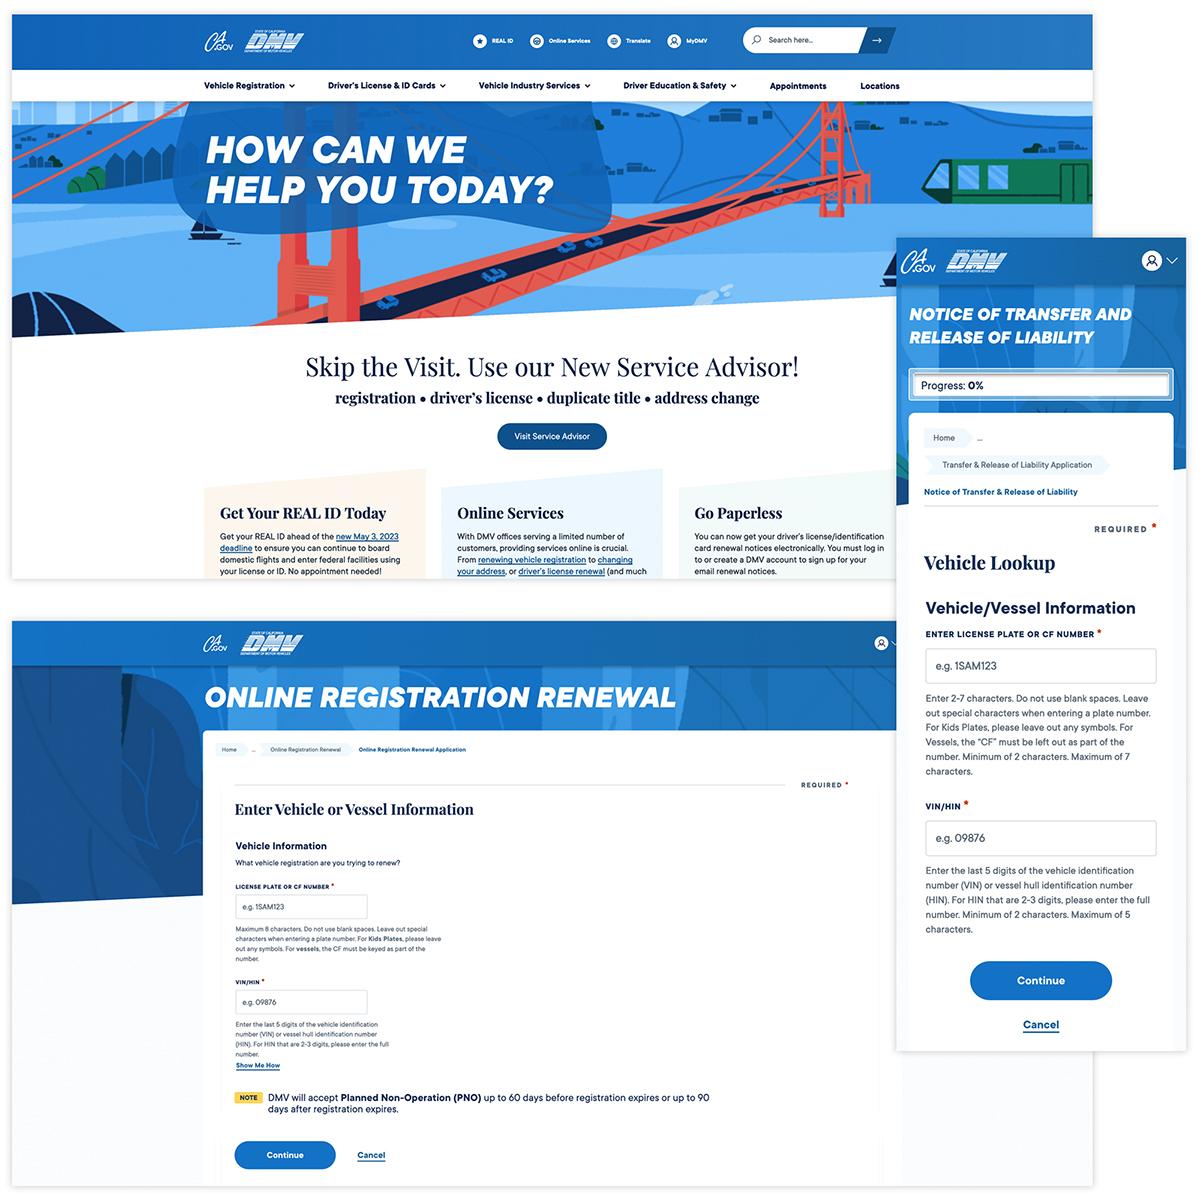 Visual Parity Between DMV Website And Applications